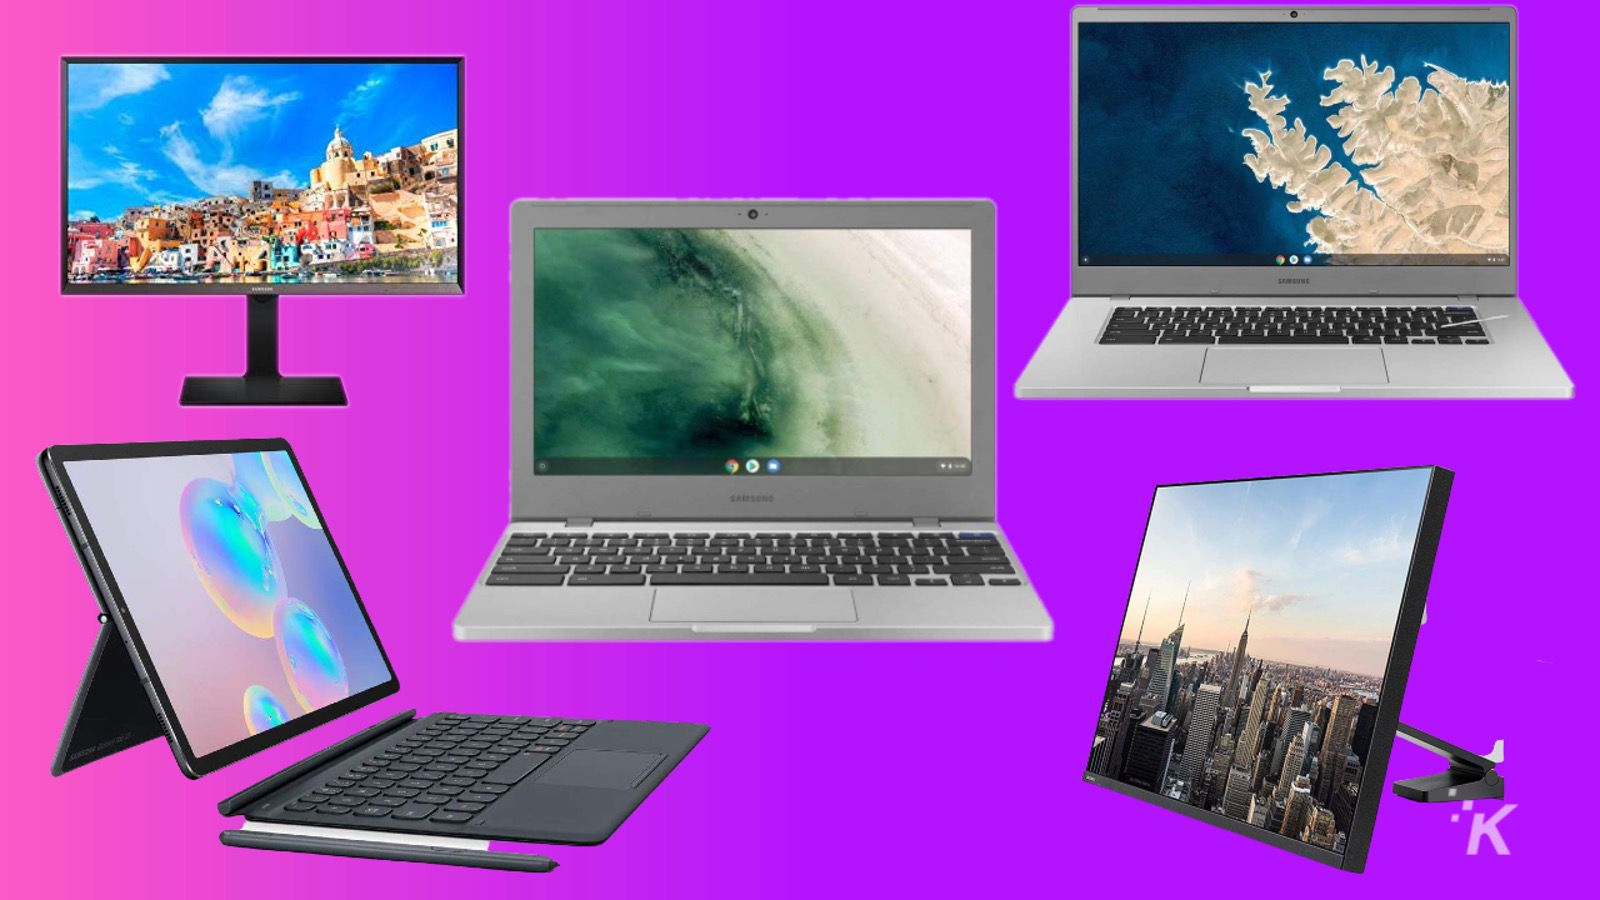 laptop chromebook monitor sale knowtechie amazon